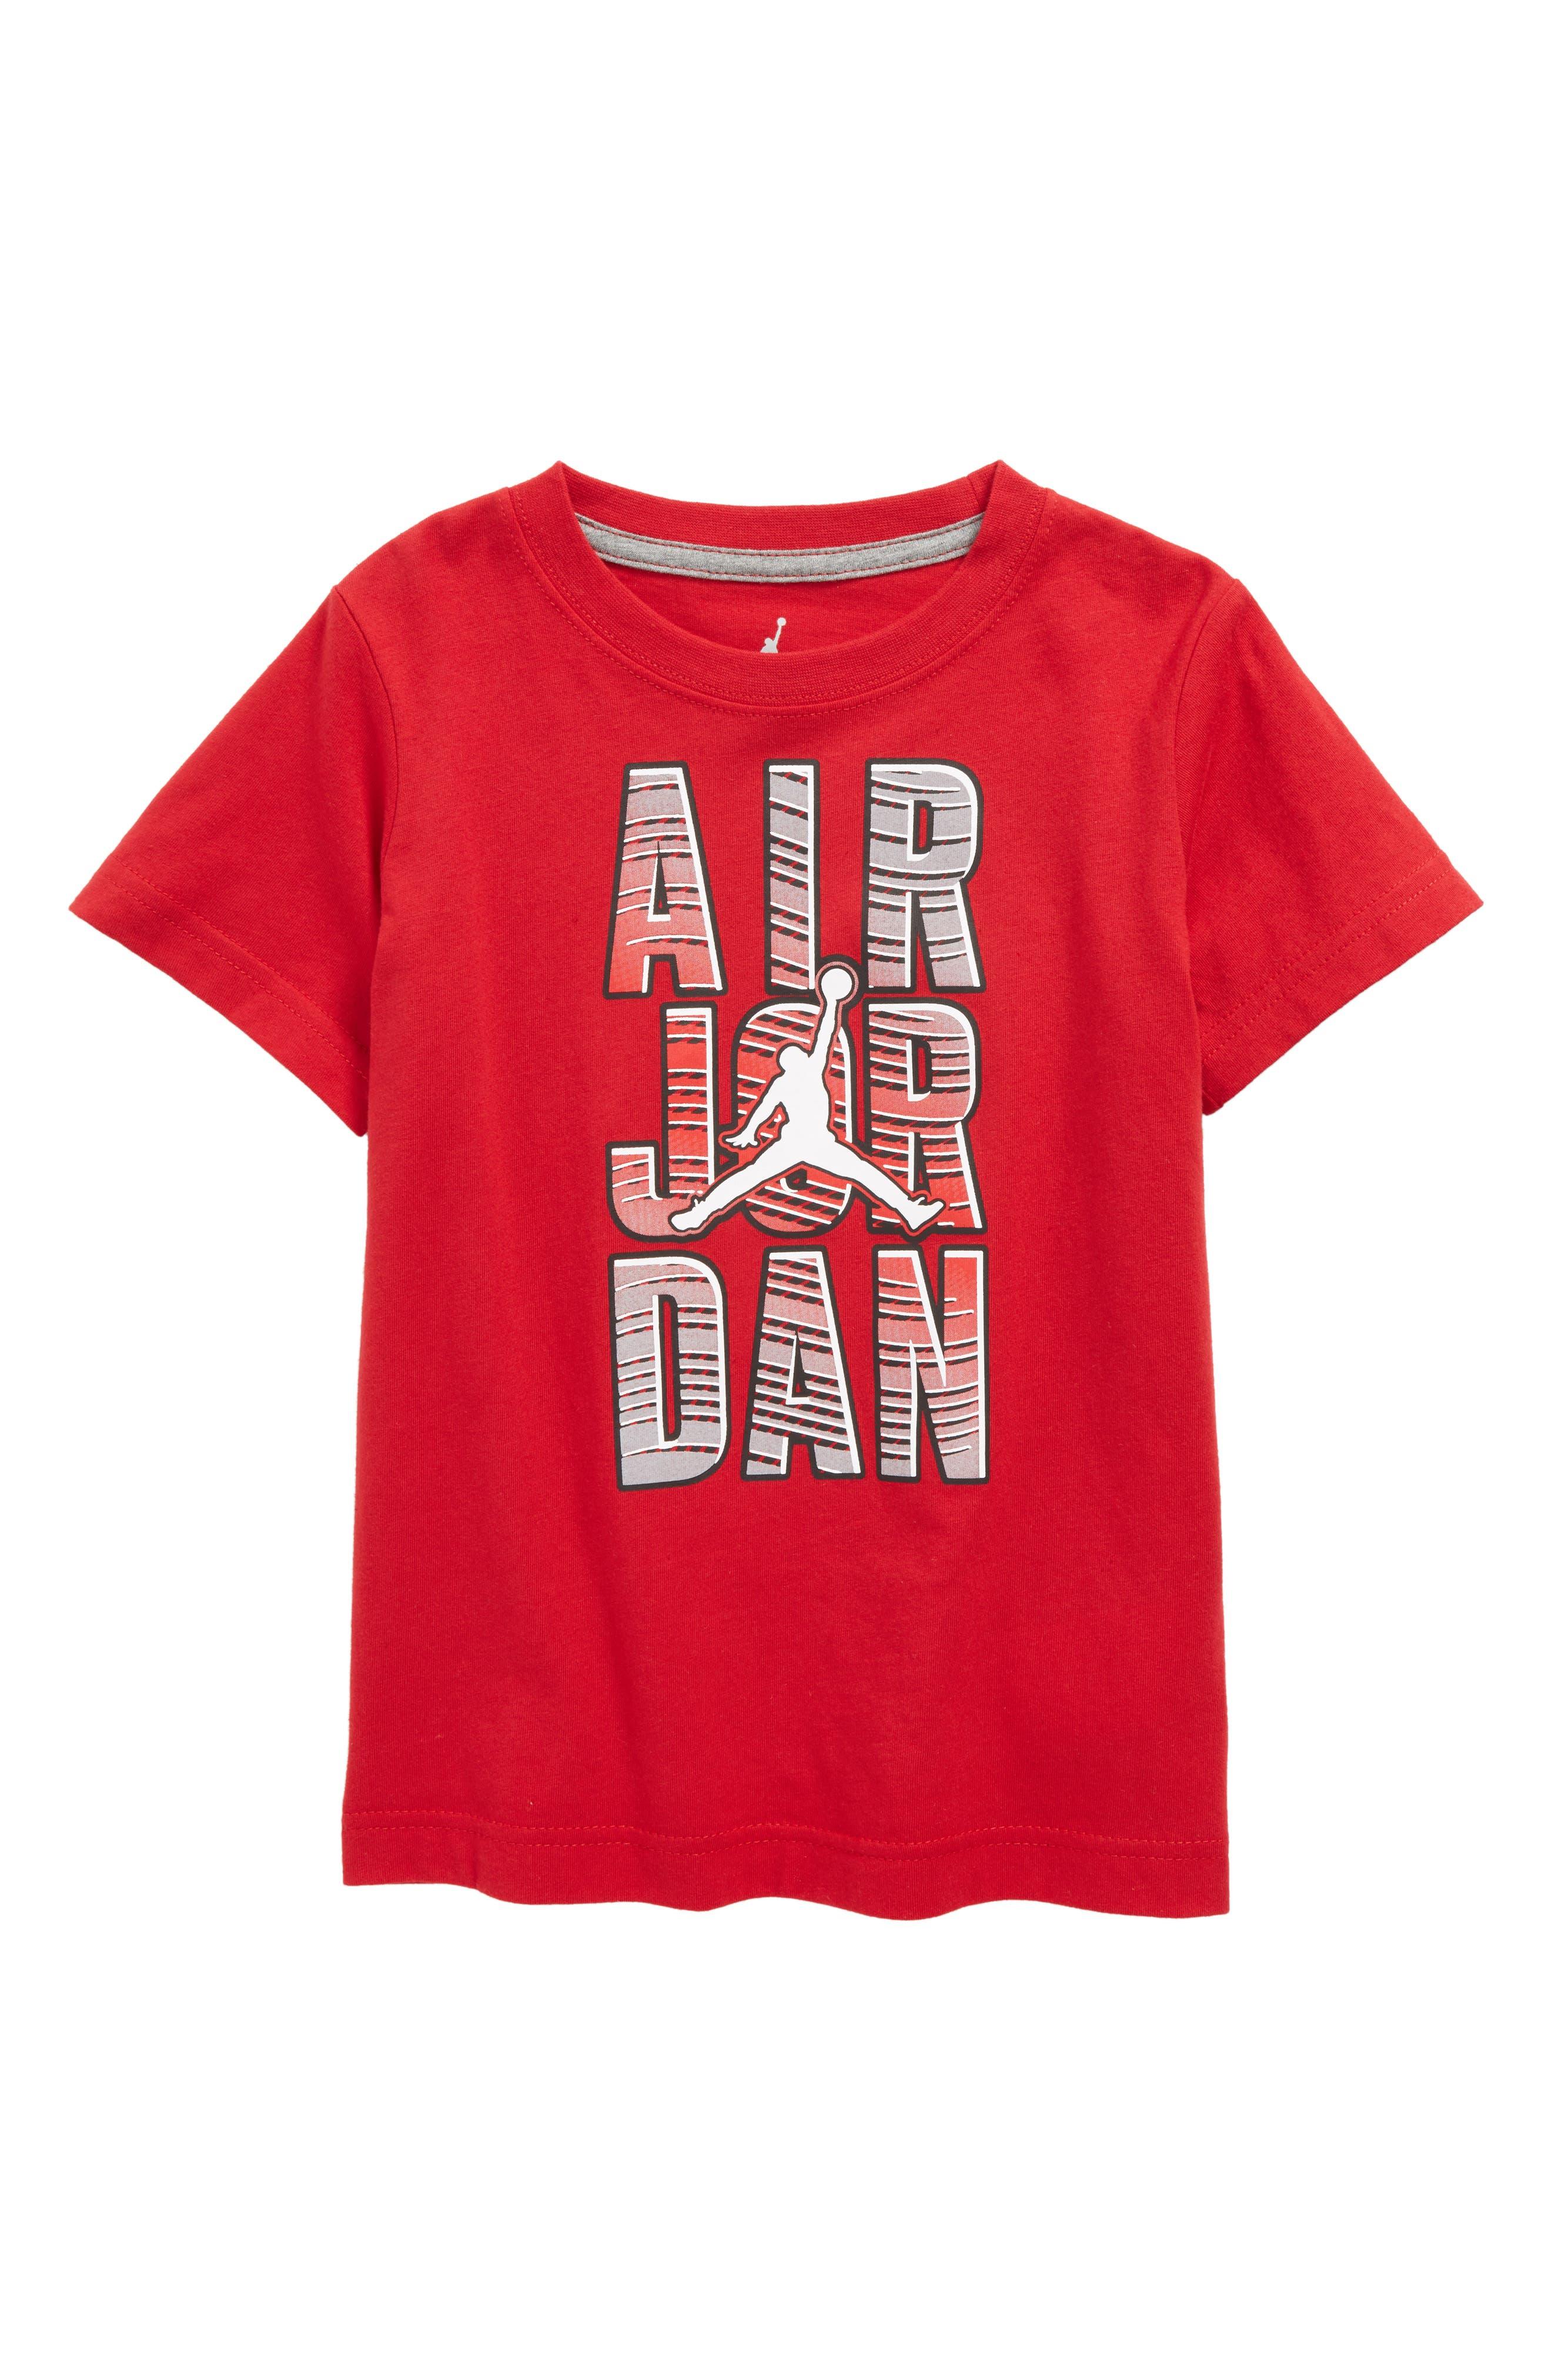 Jordan Reveal Graphic T-Shirt,                             Main thumbnail 1, color,                             606